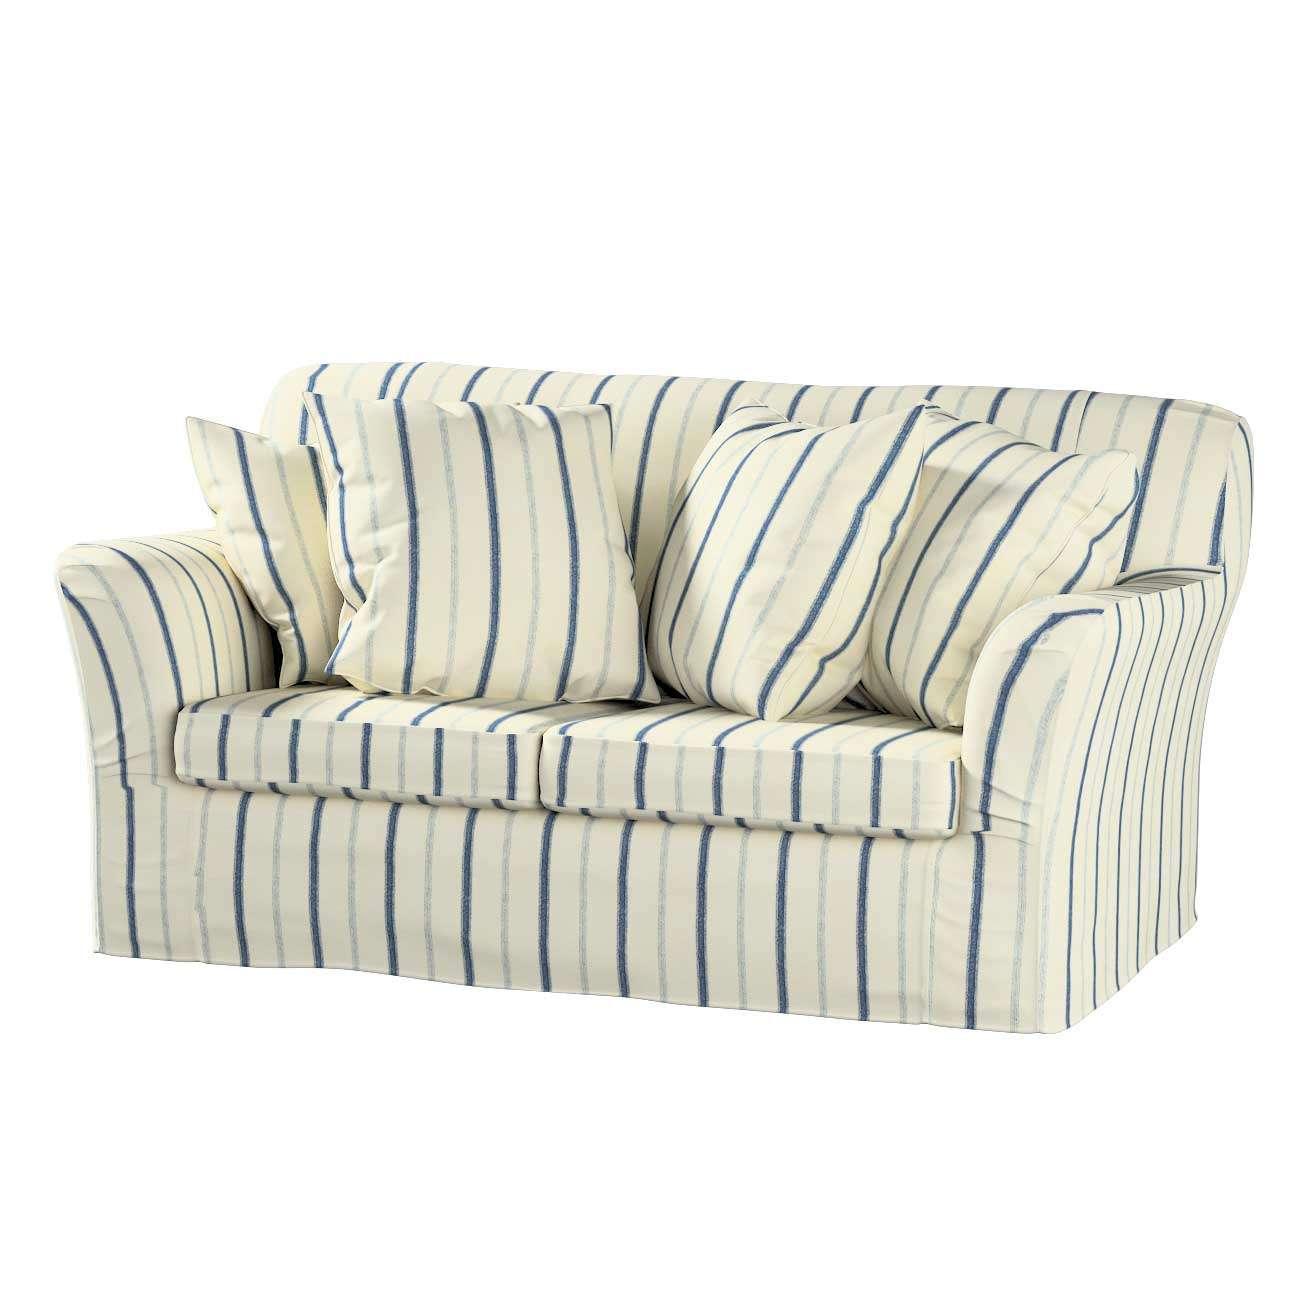 Tomelilla 2 seater sofa cover, blue stripes, ivory background, 129 66, Tomelilla 2 seat sofa